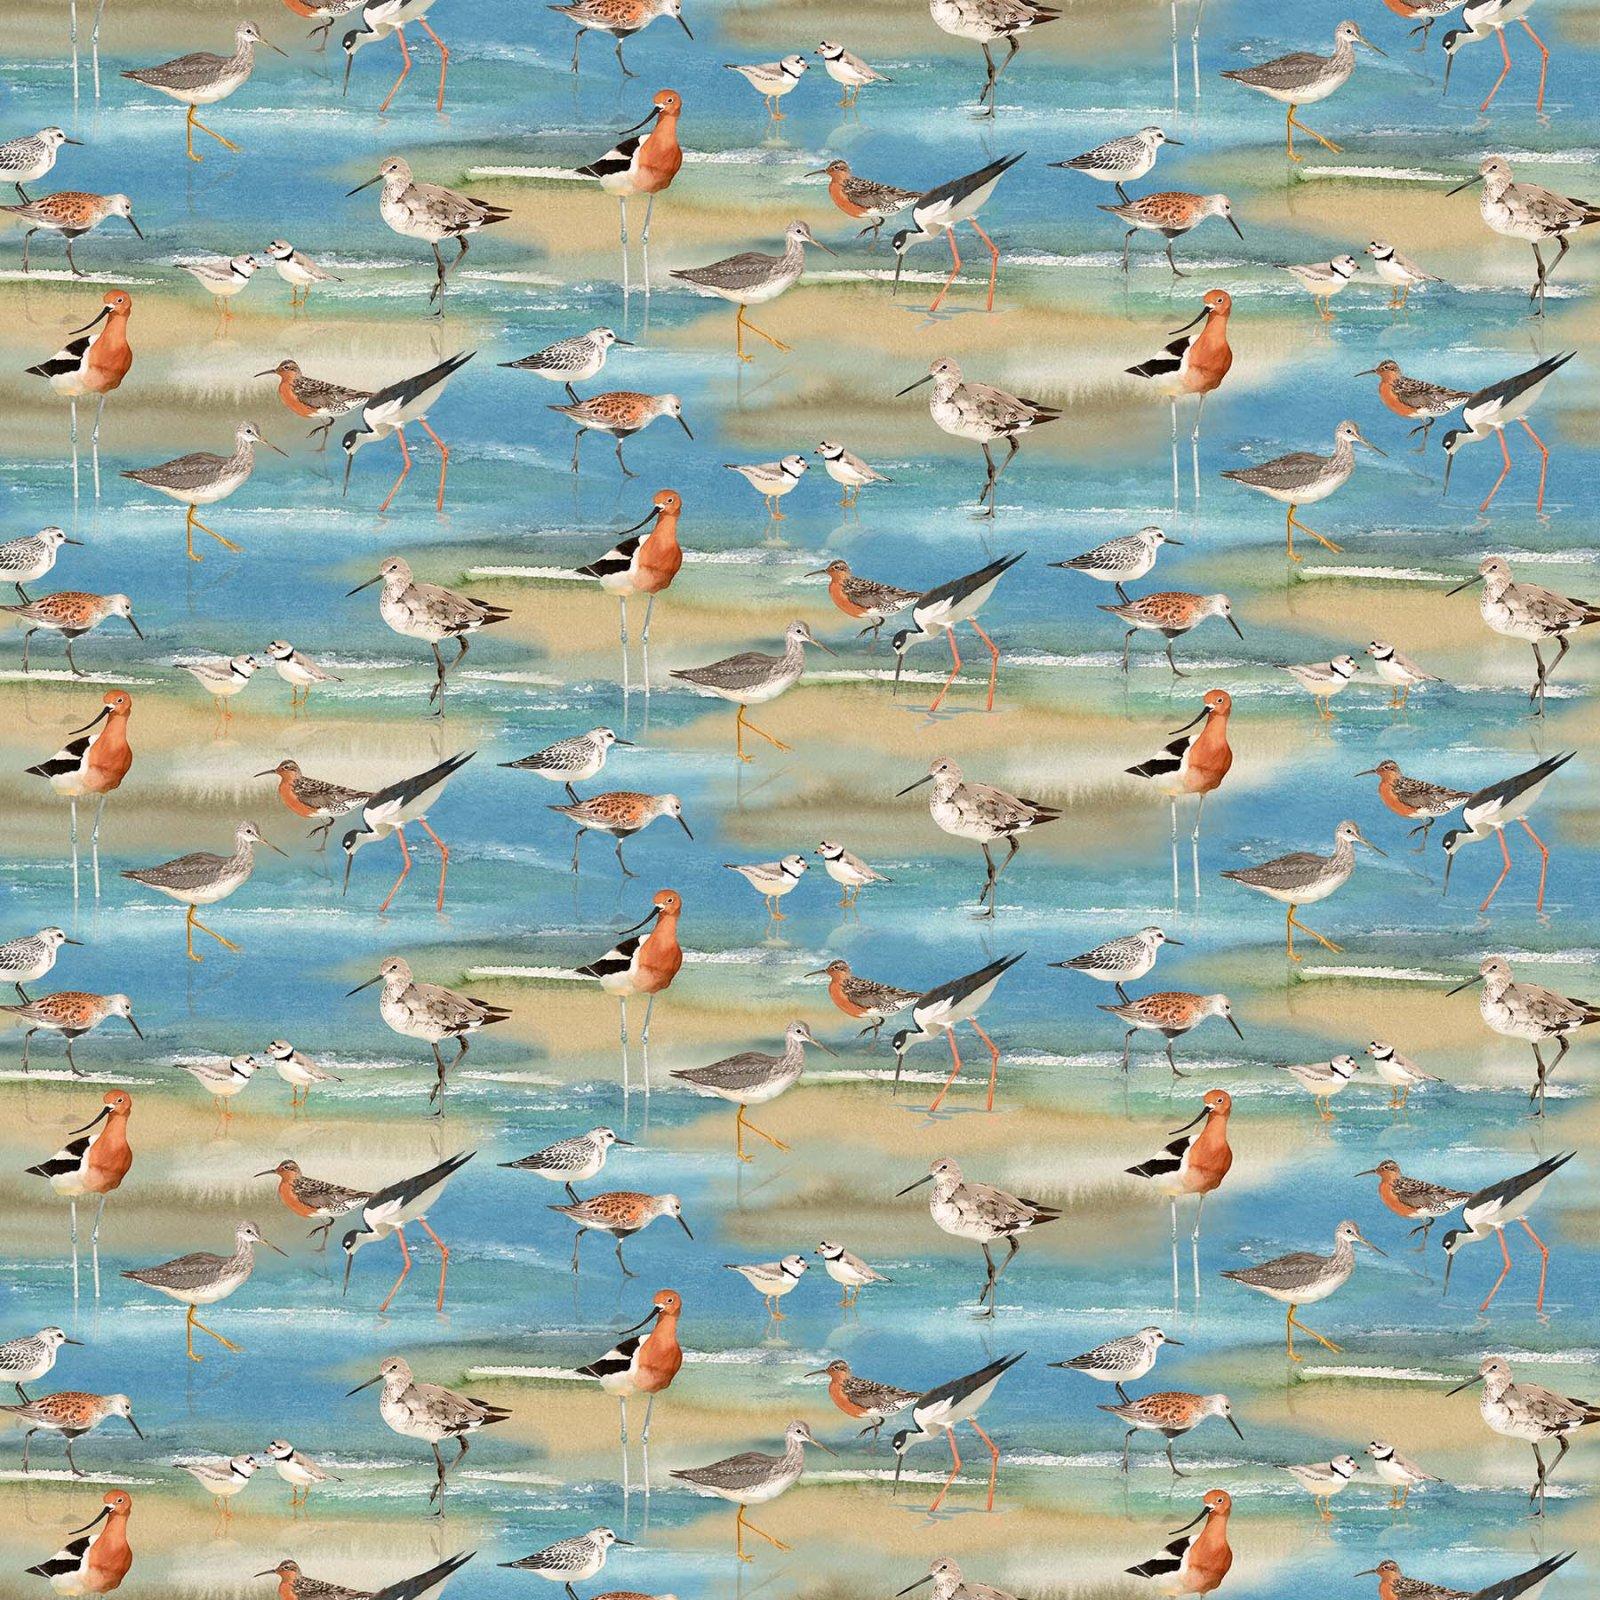 Shore Thing 22070-42 birds